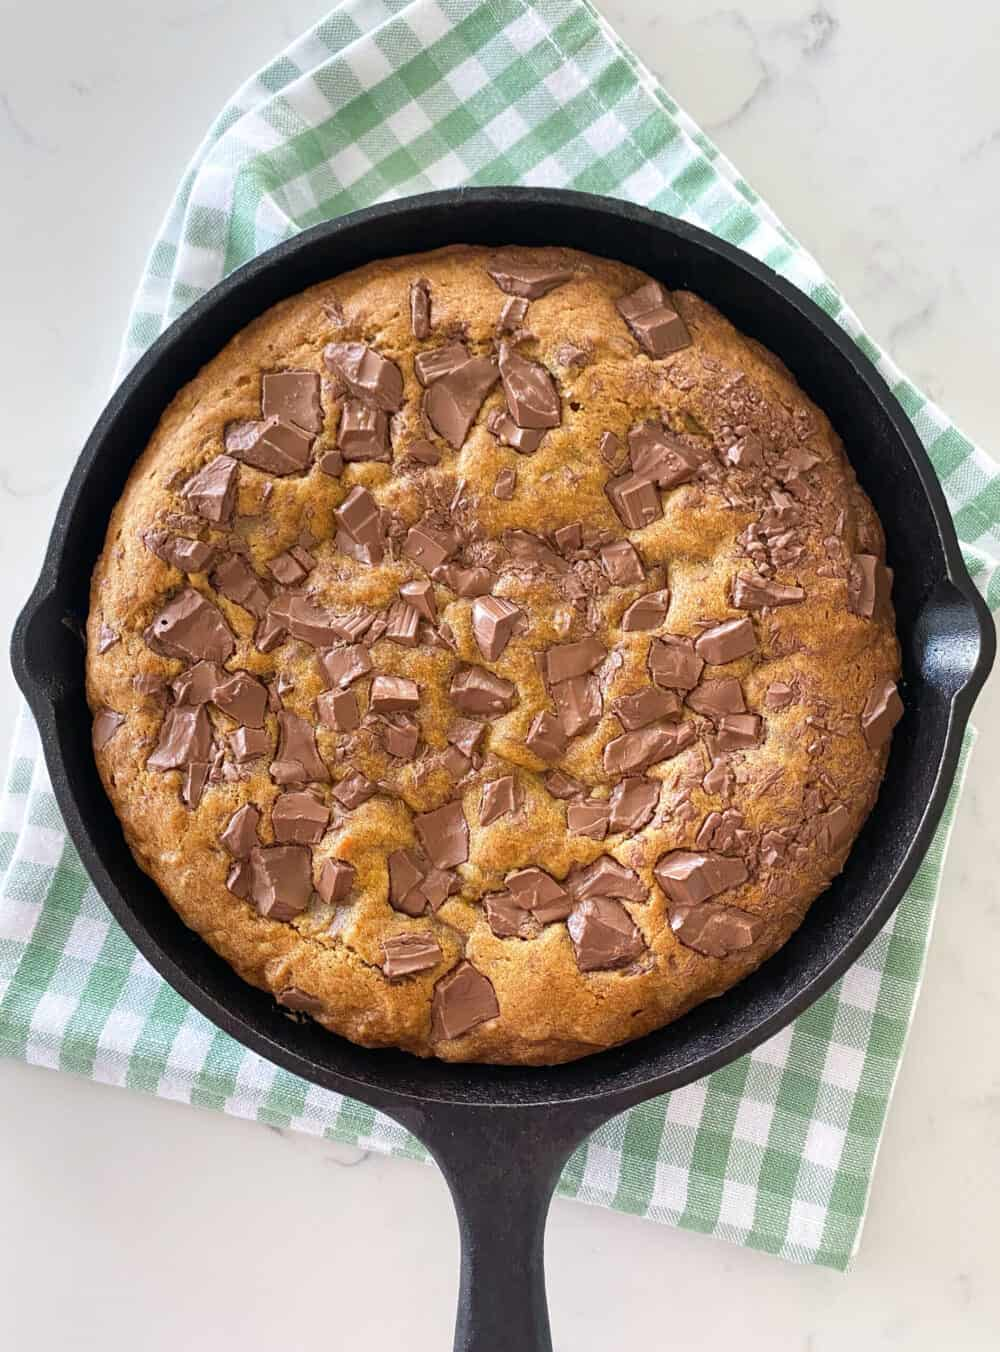 baked skillet cookie